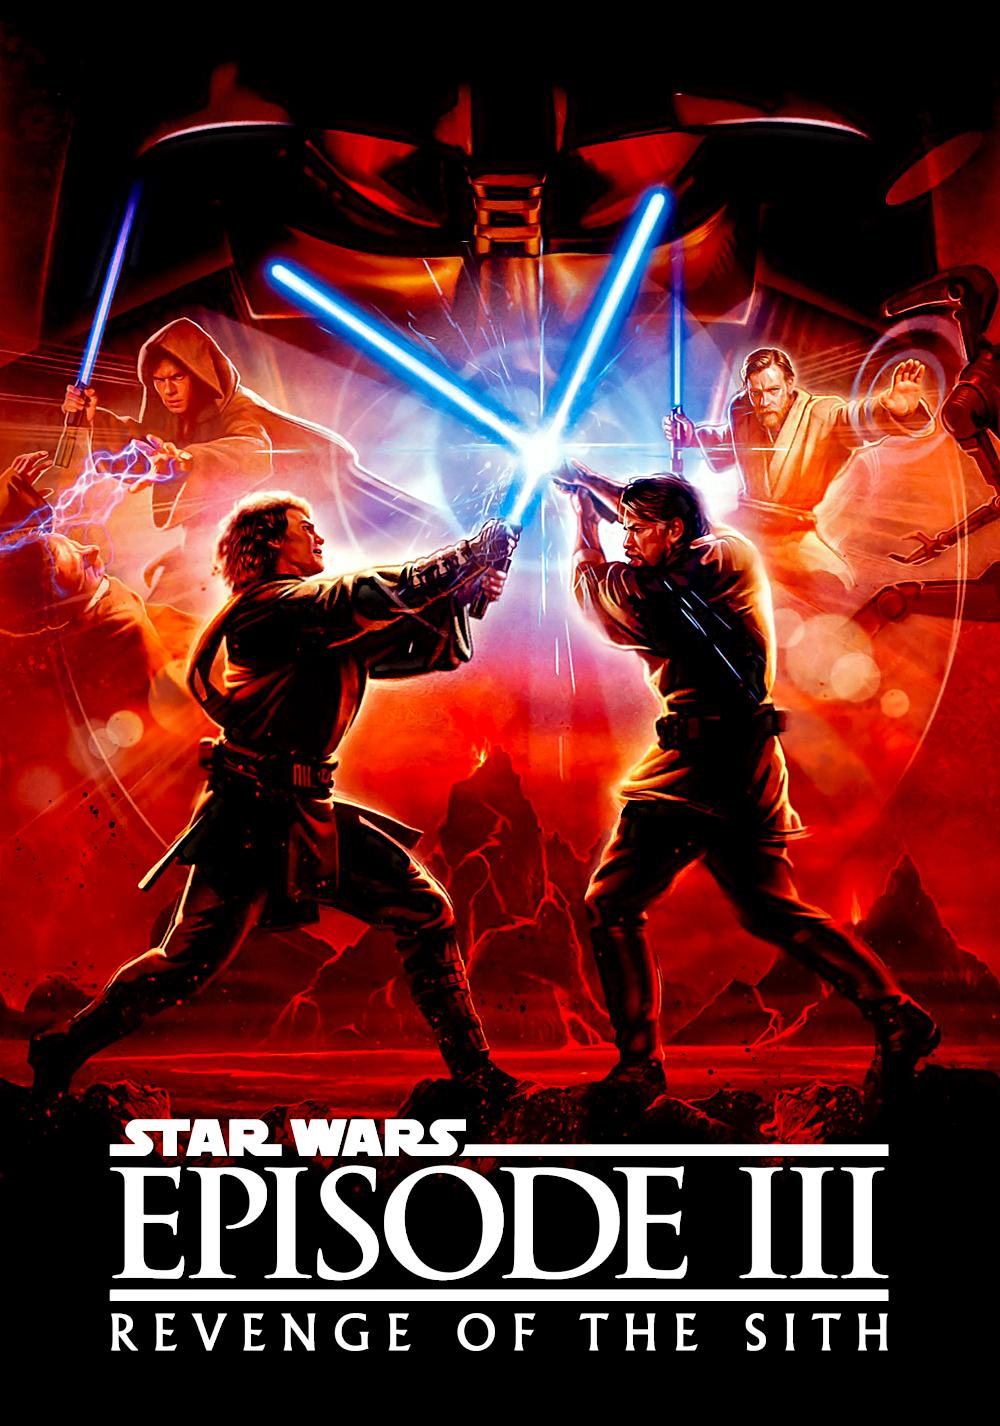 Звёздные войны: Эпизод 3